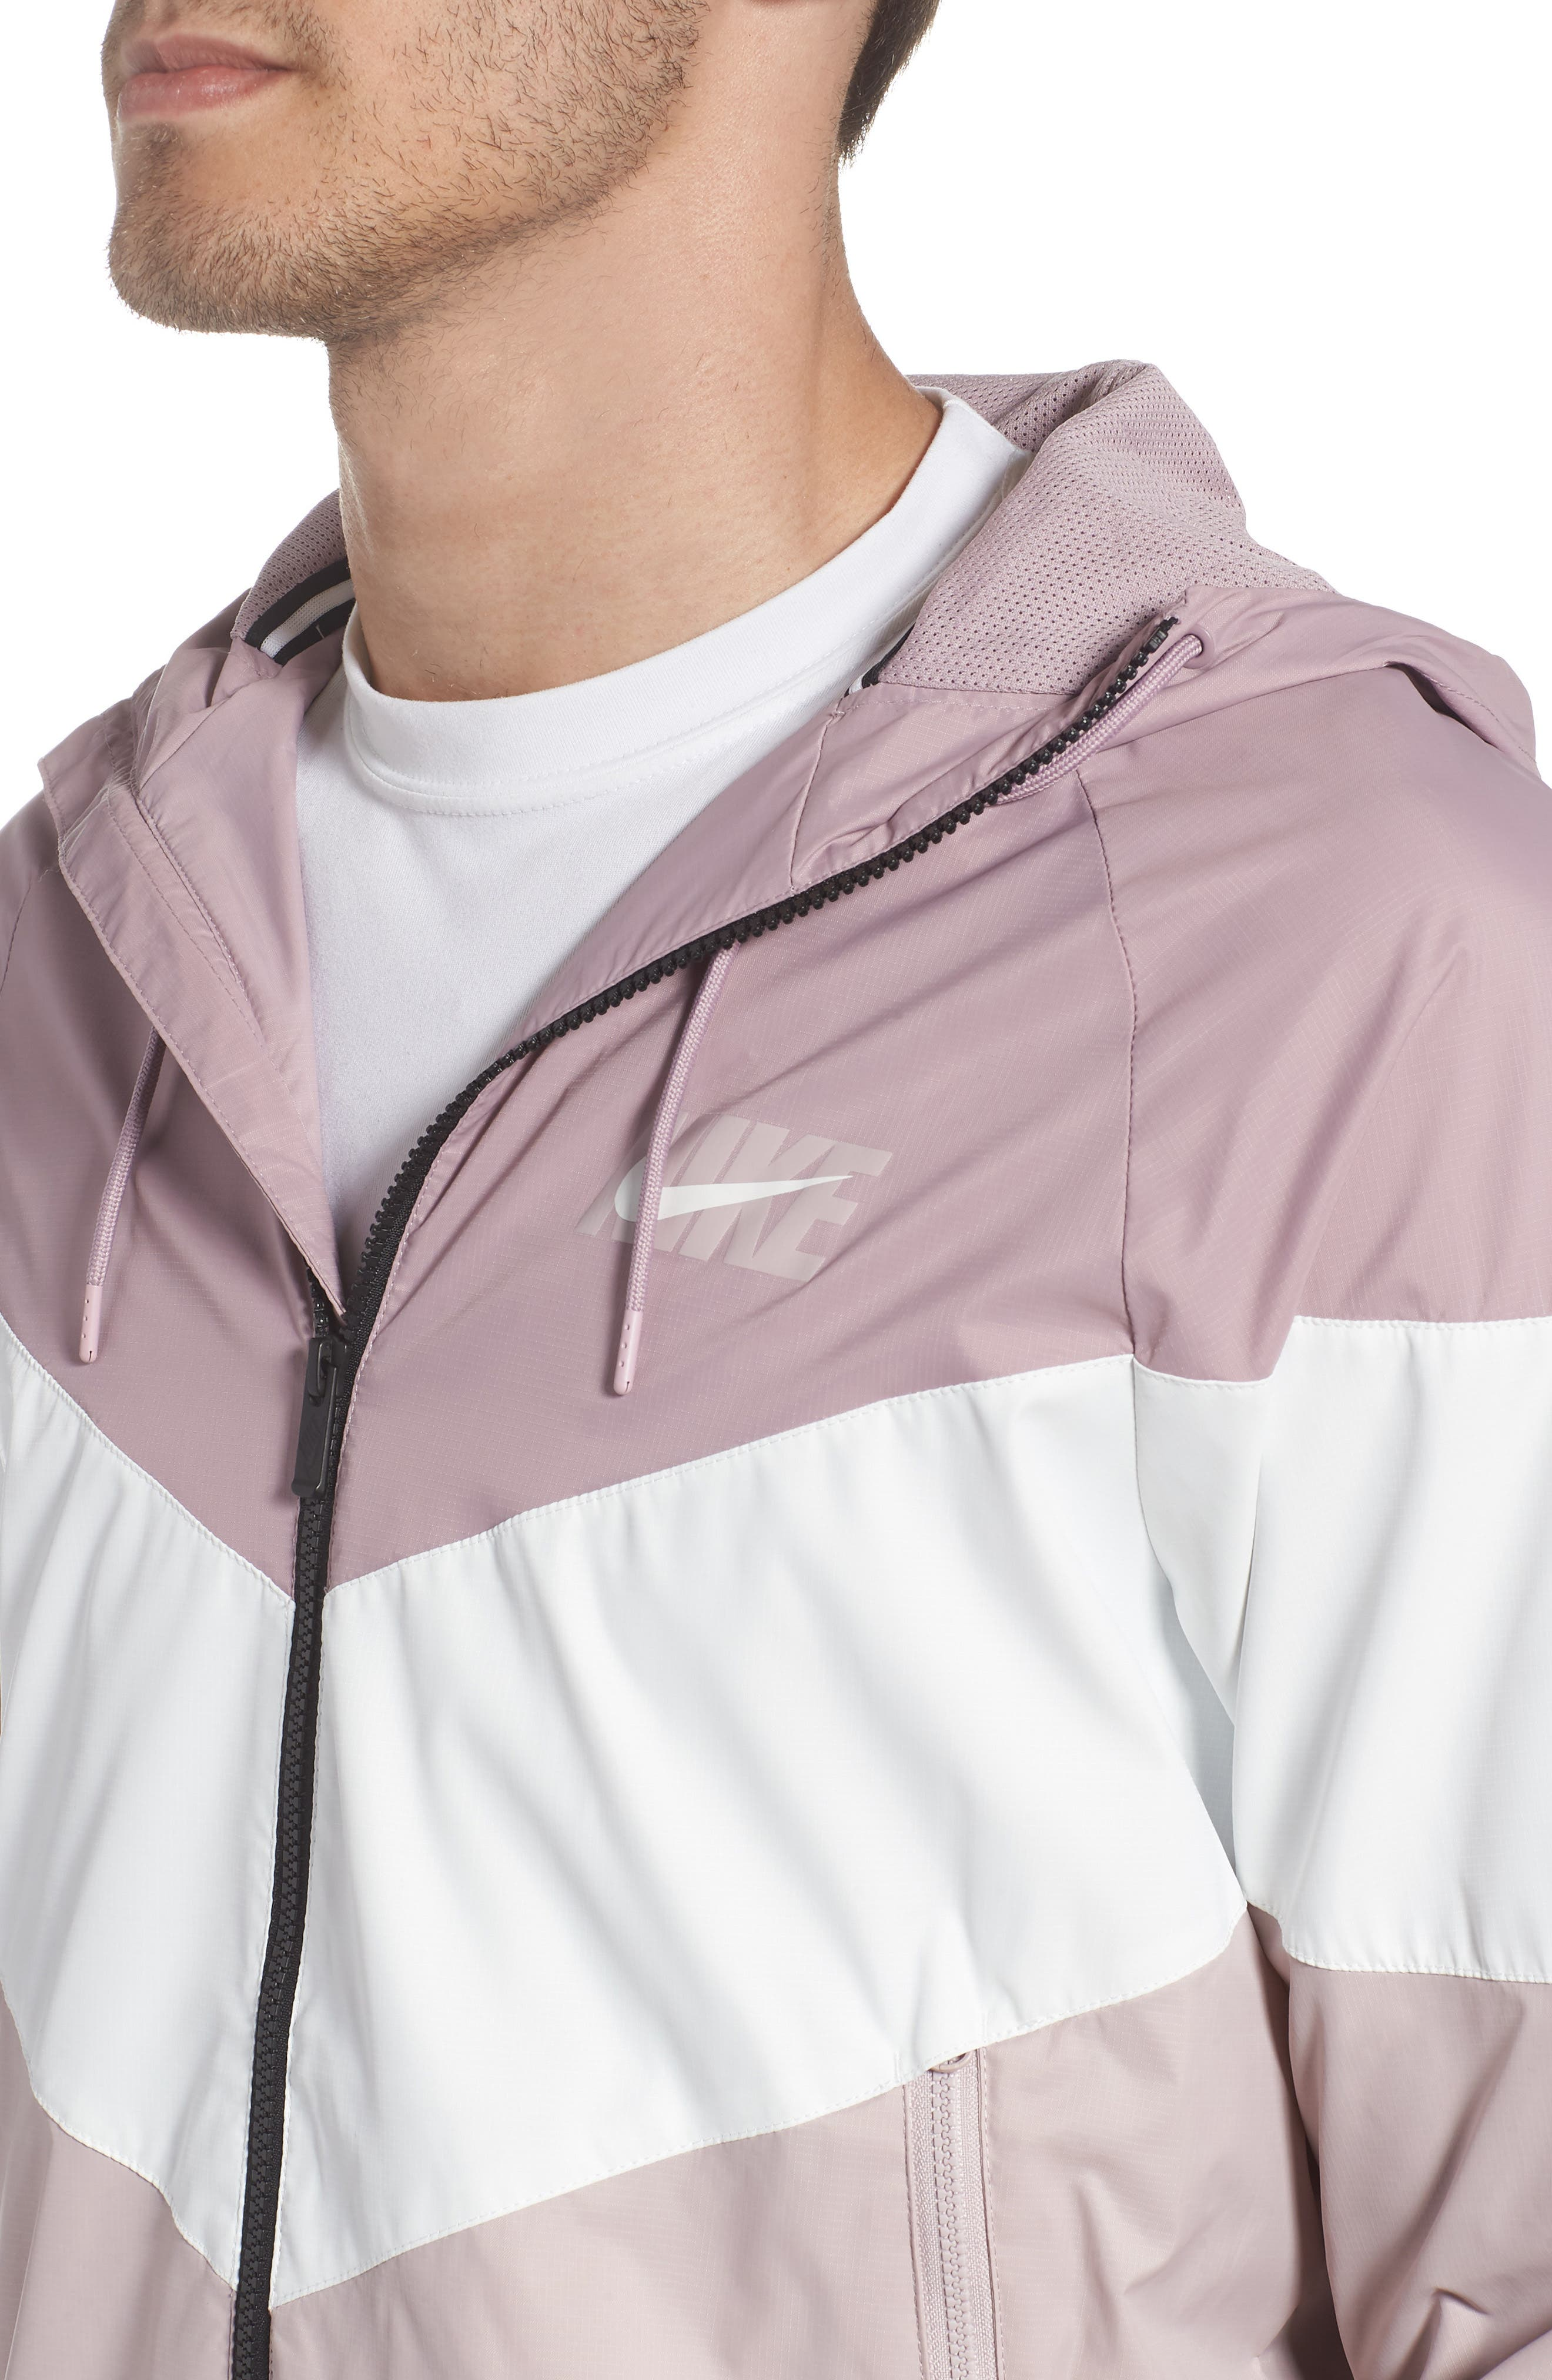 Windrunner Wind & Water Repellent Hooded Jacket,                             Alternate thumbnail 4, color,                             Elemental Rose/ Summit White